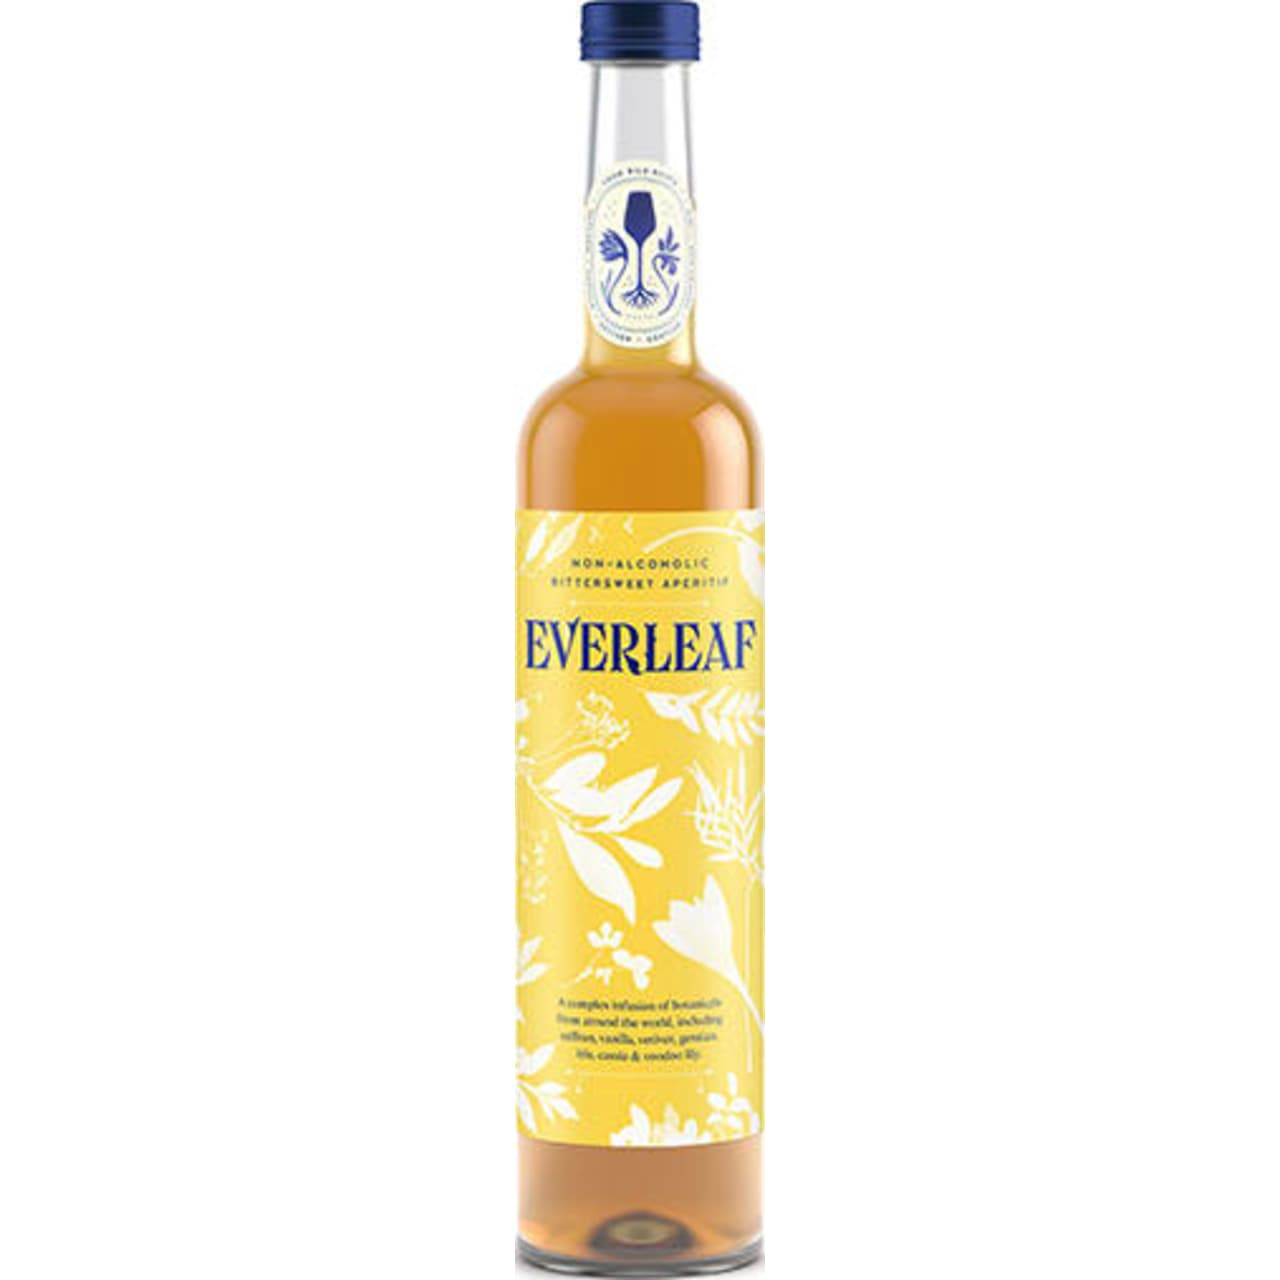 Product Image - Everleaf drinks Everleaf Non-Alcoholic Bittersweet Aperitif